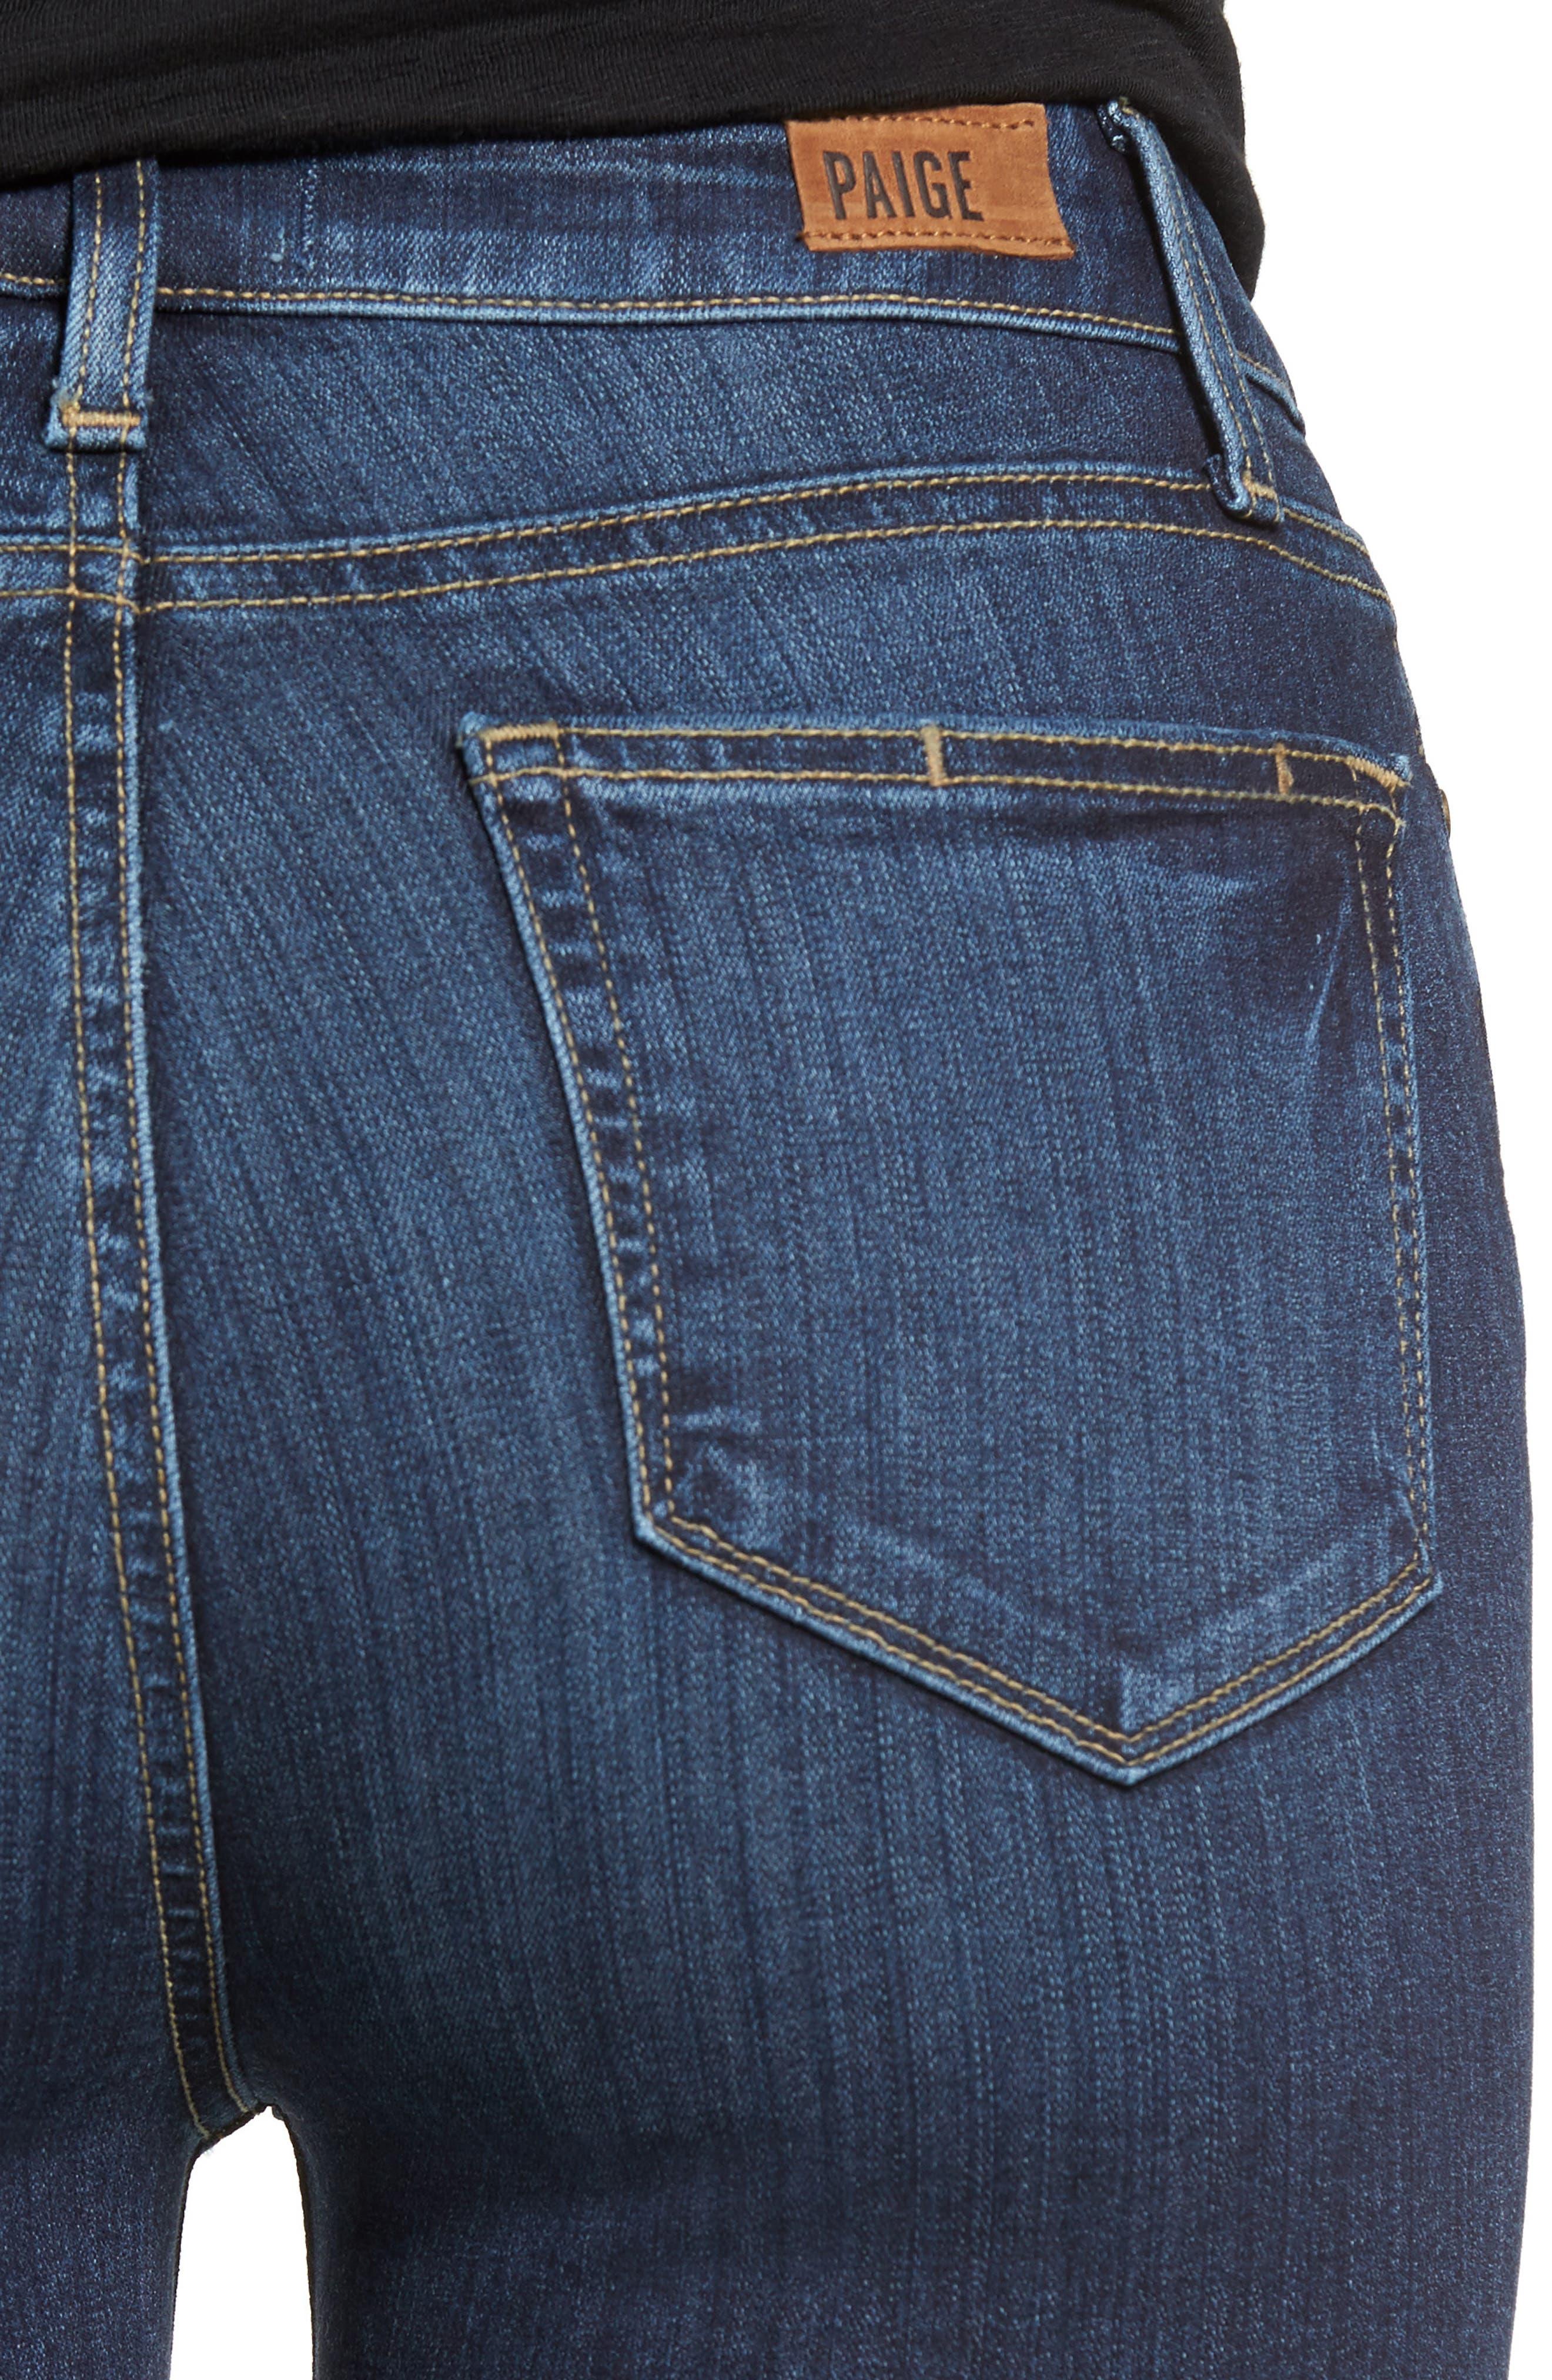 Hoxton High Waist Skinny Jeans,                             Alternate thumbnail 4, color,                             400